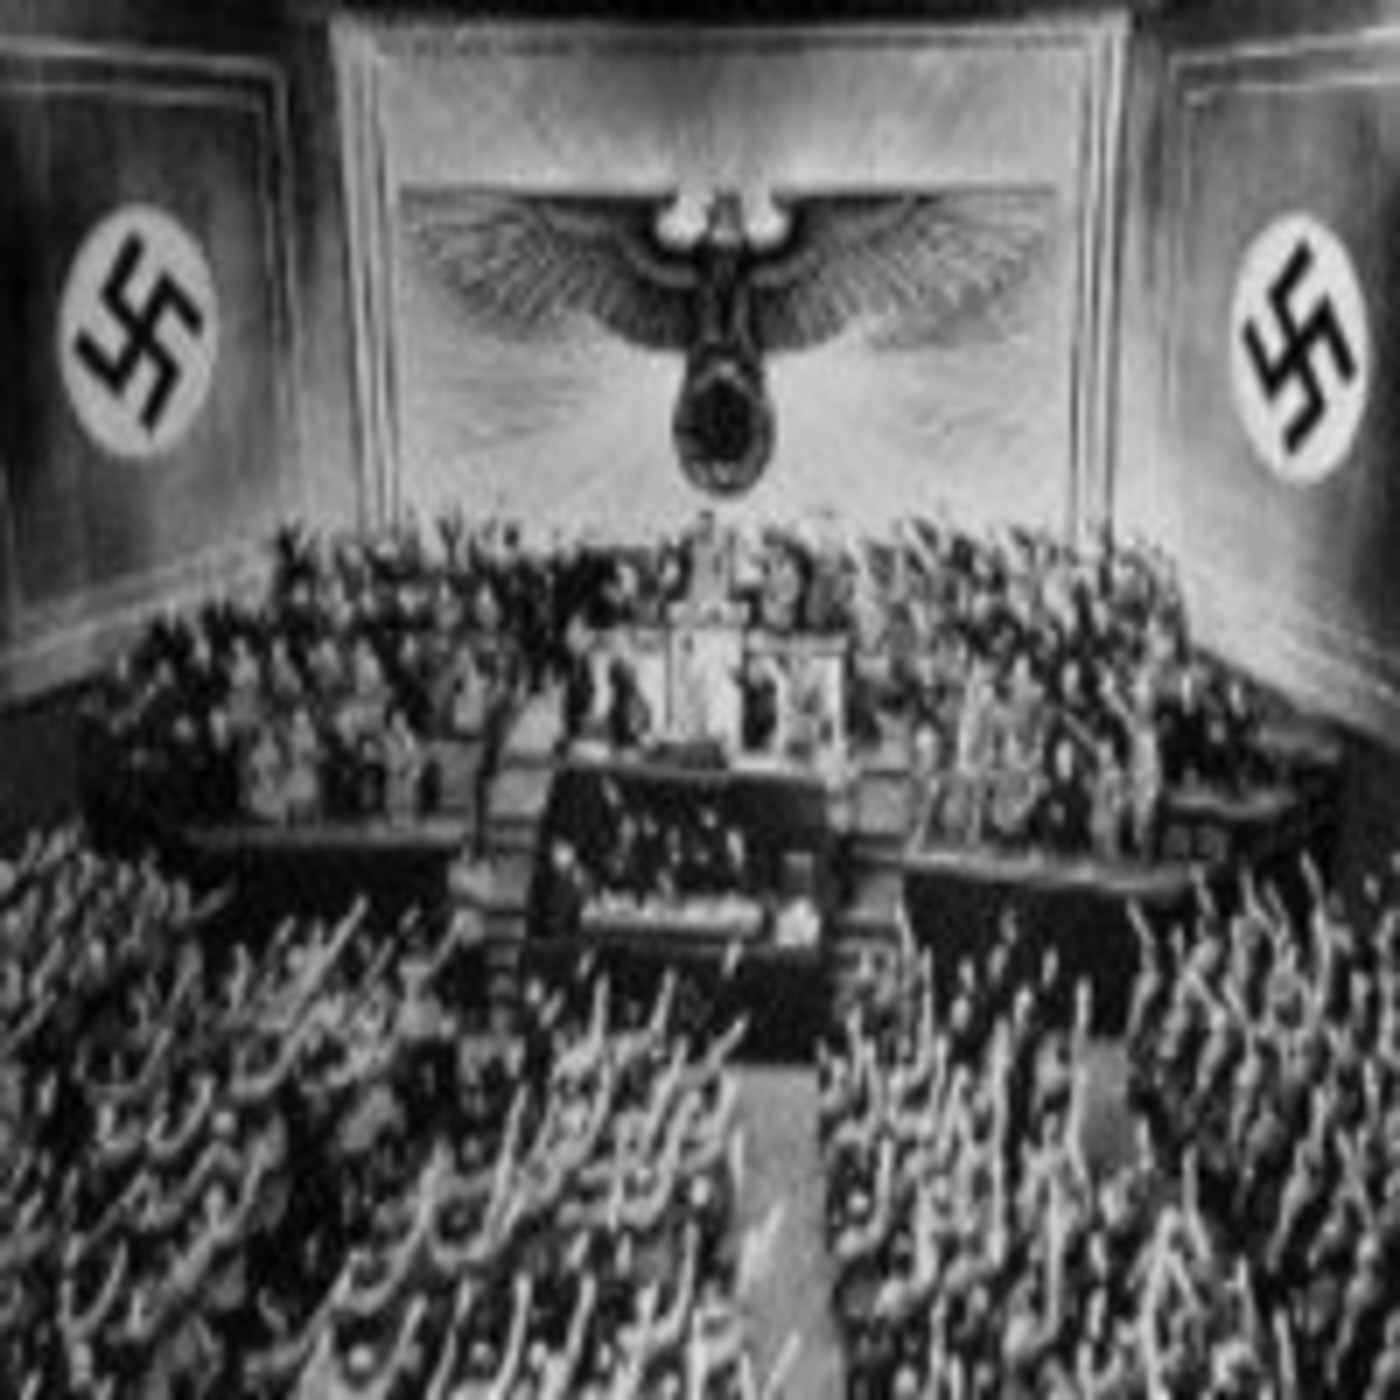 Historia de la Gestapo (1 de 23)